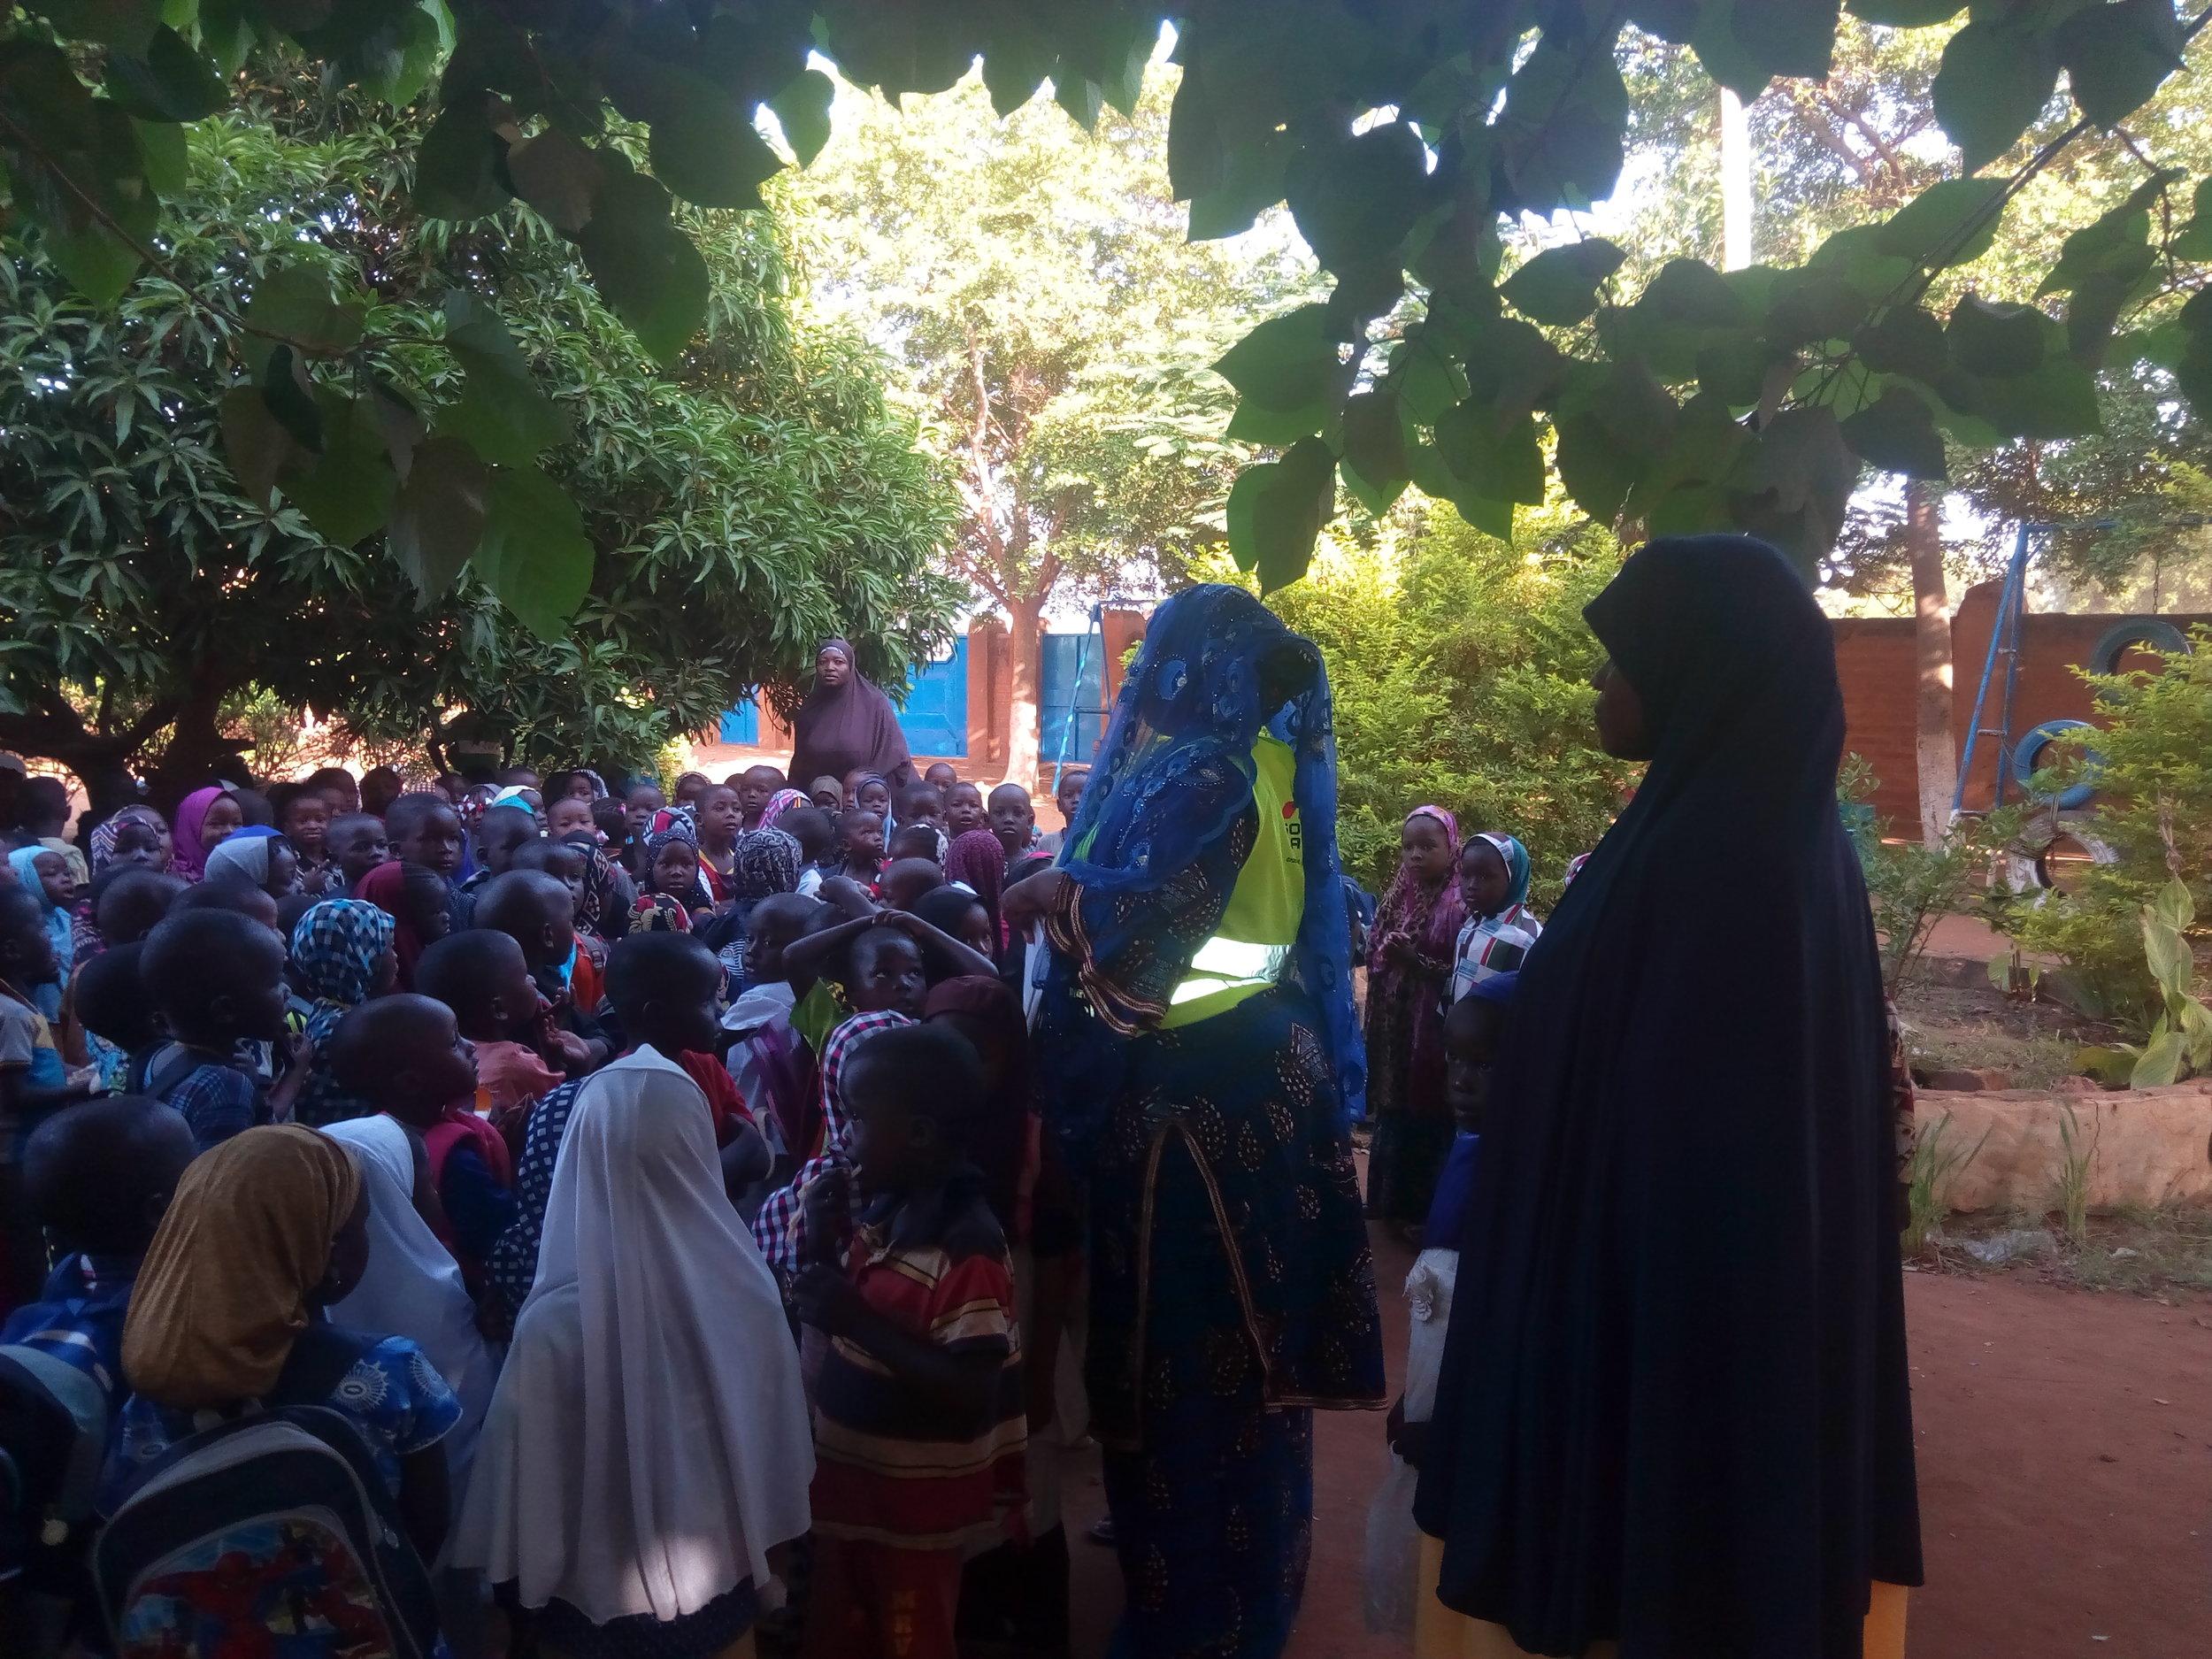 The community gathered to discuss the park renovation. Credit: UN-Habitat